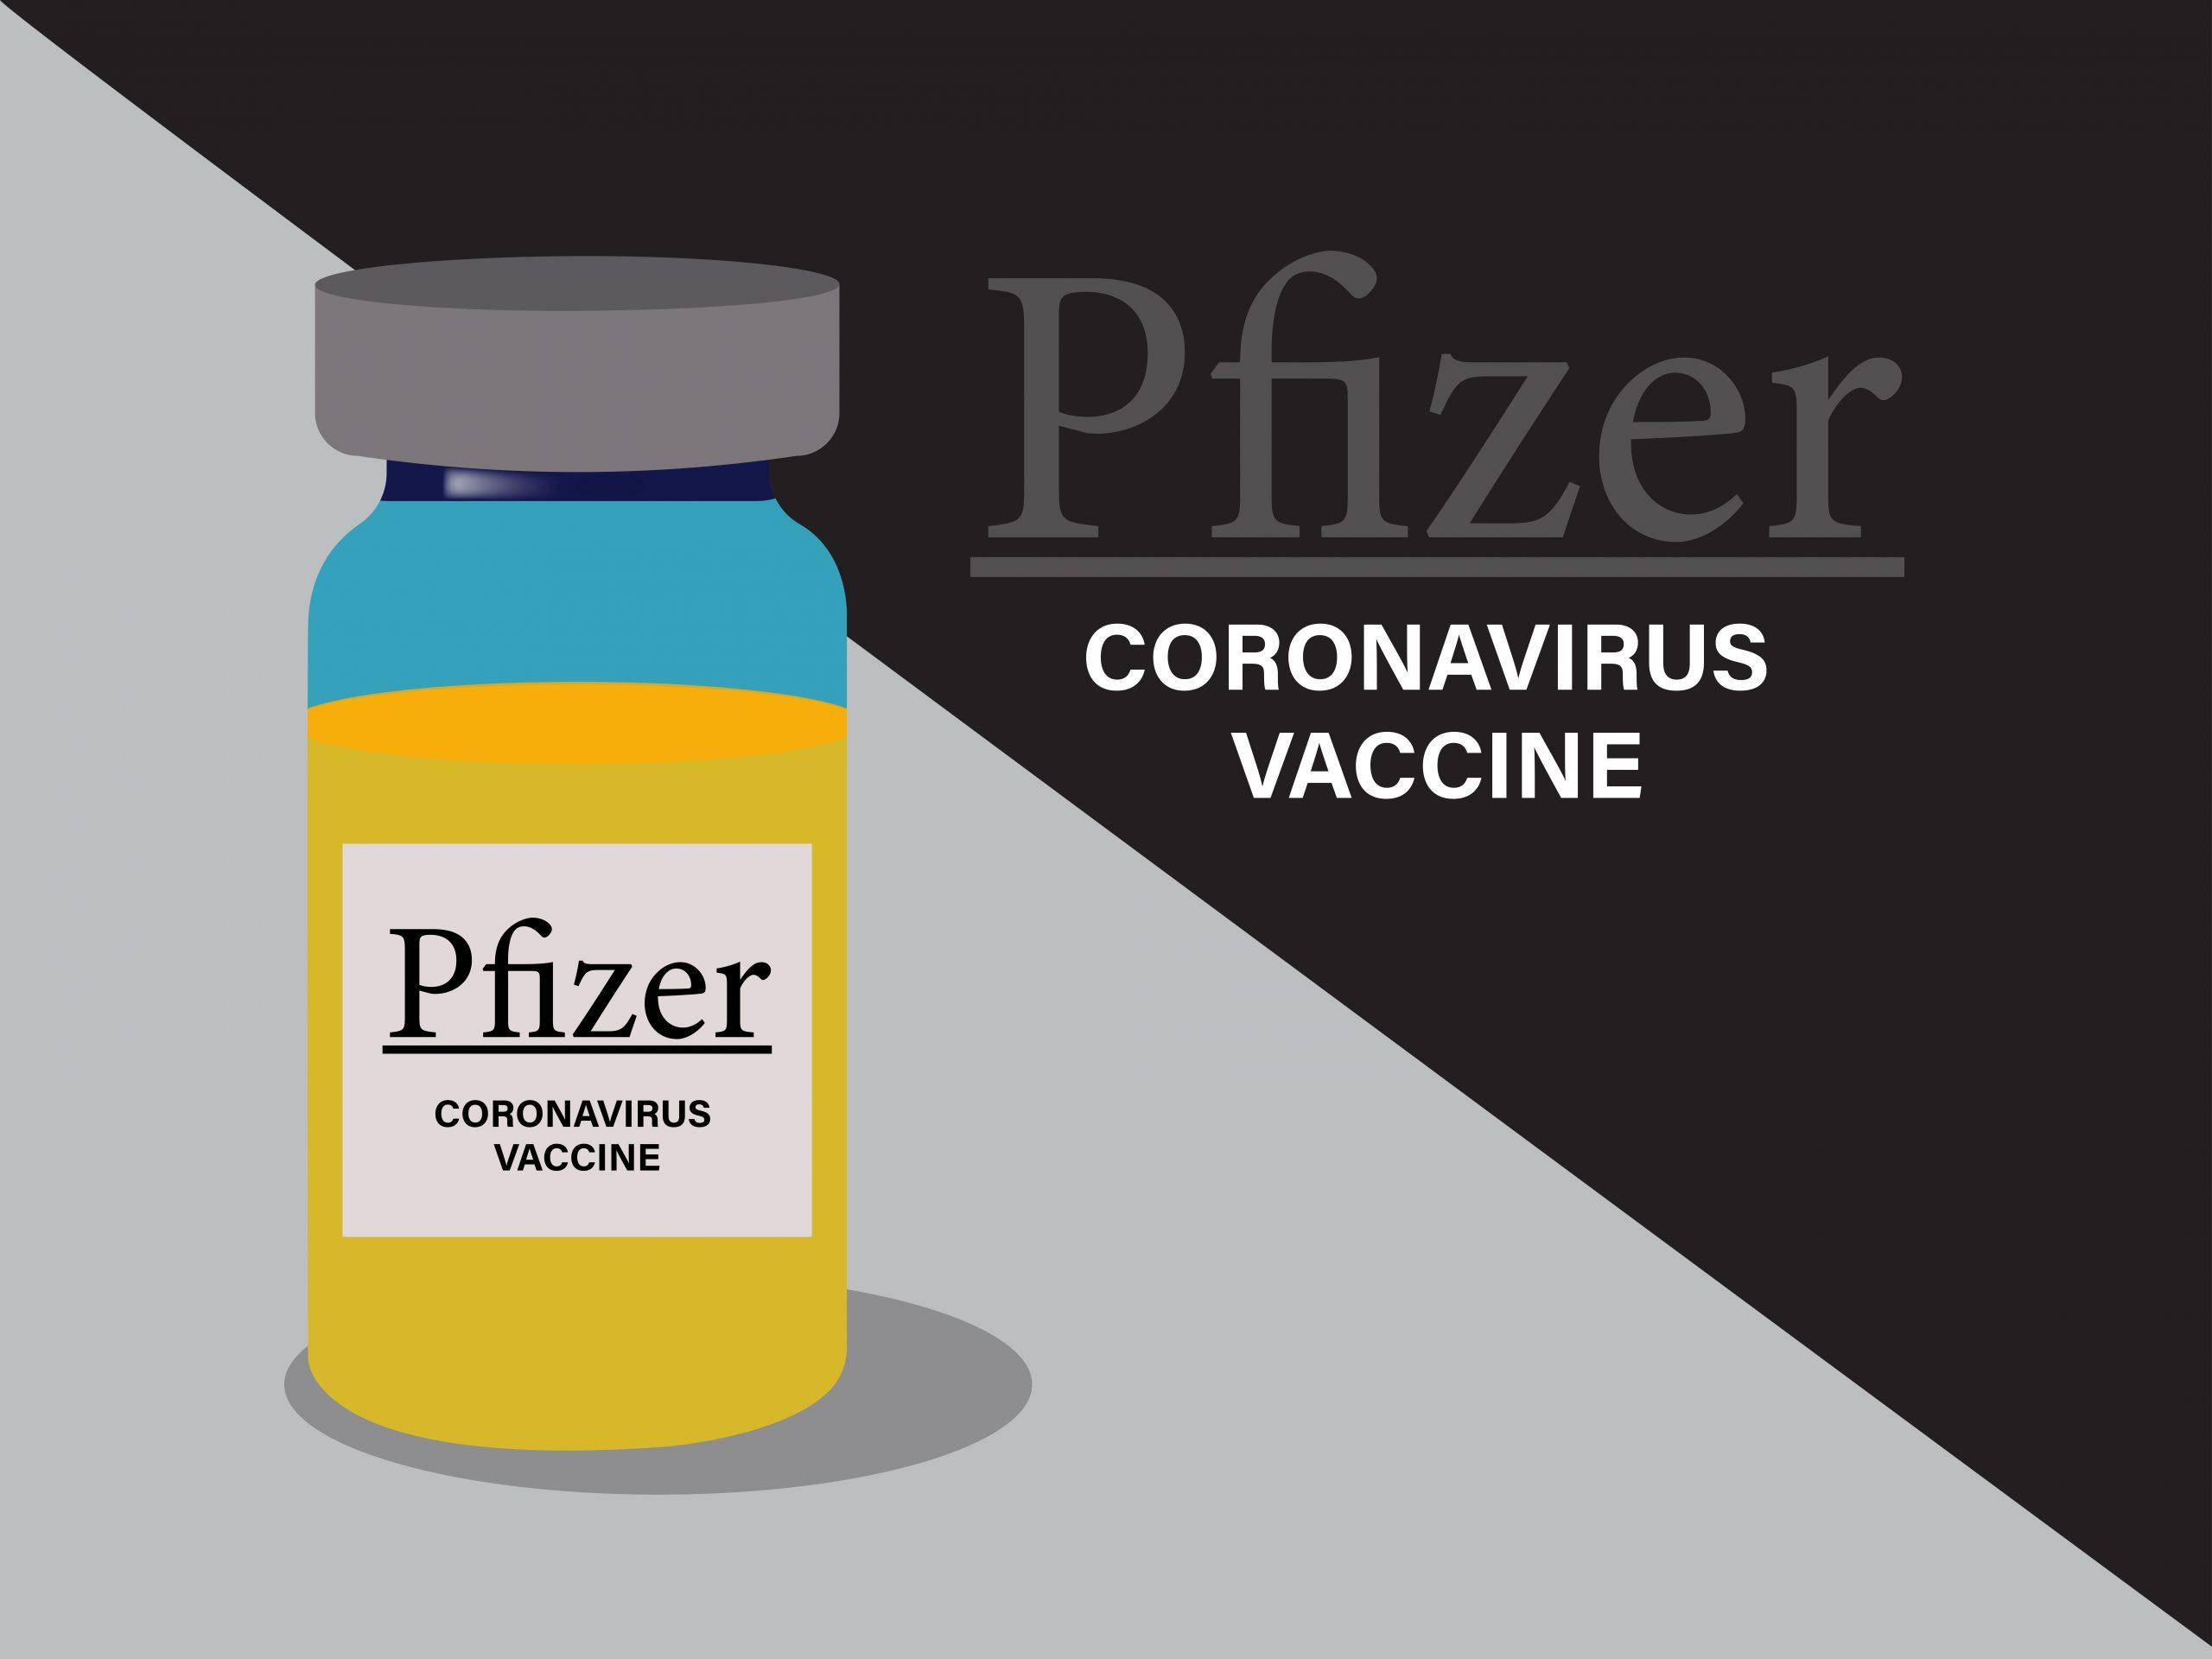 Illustration of a COVID-19 Vaccine